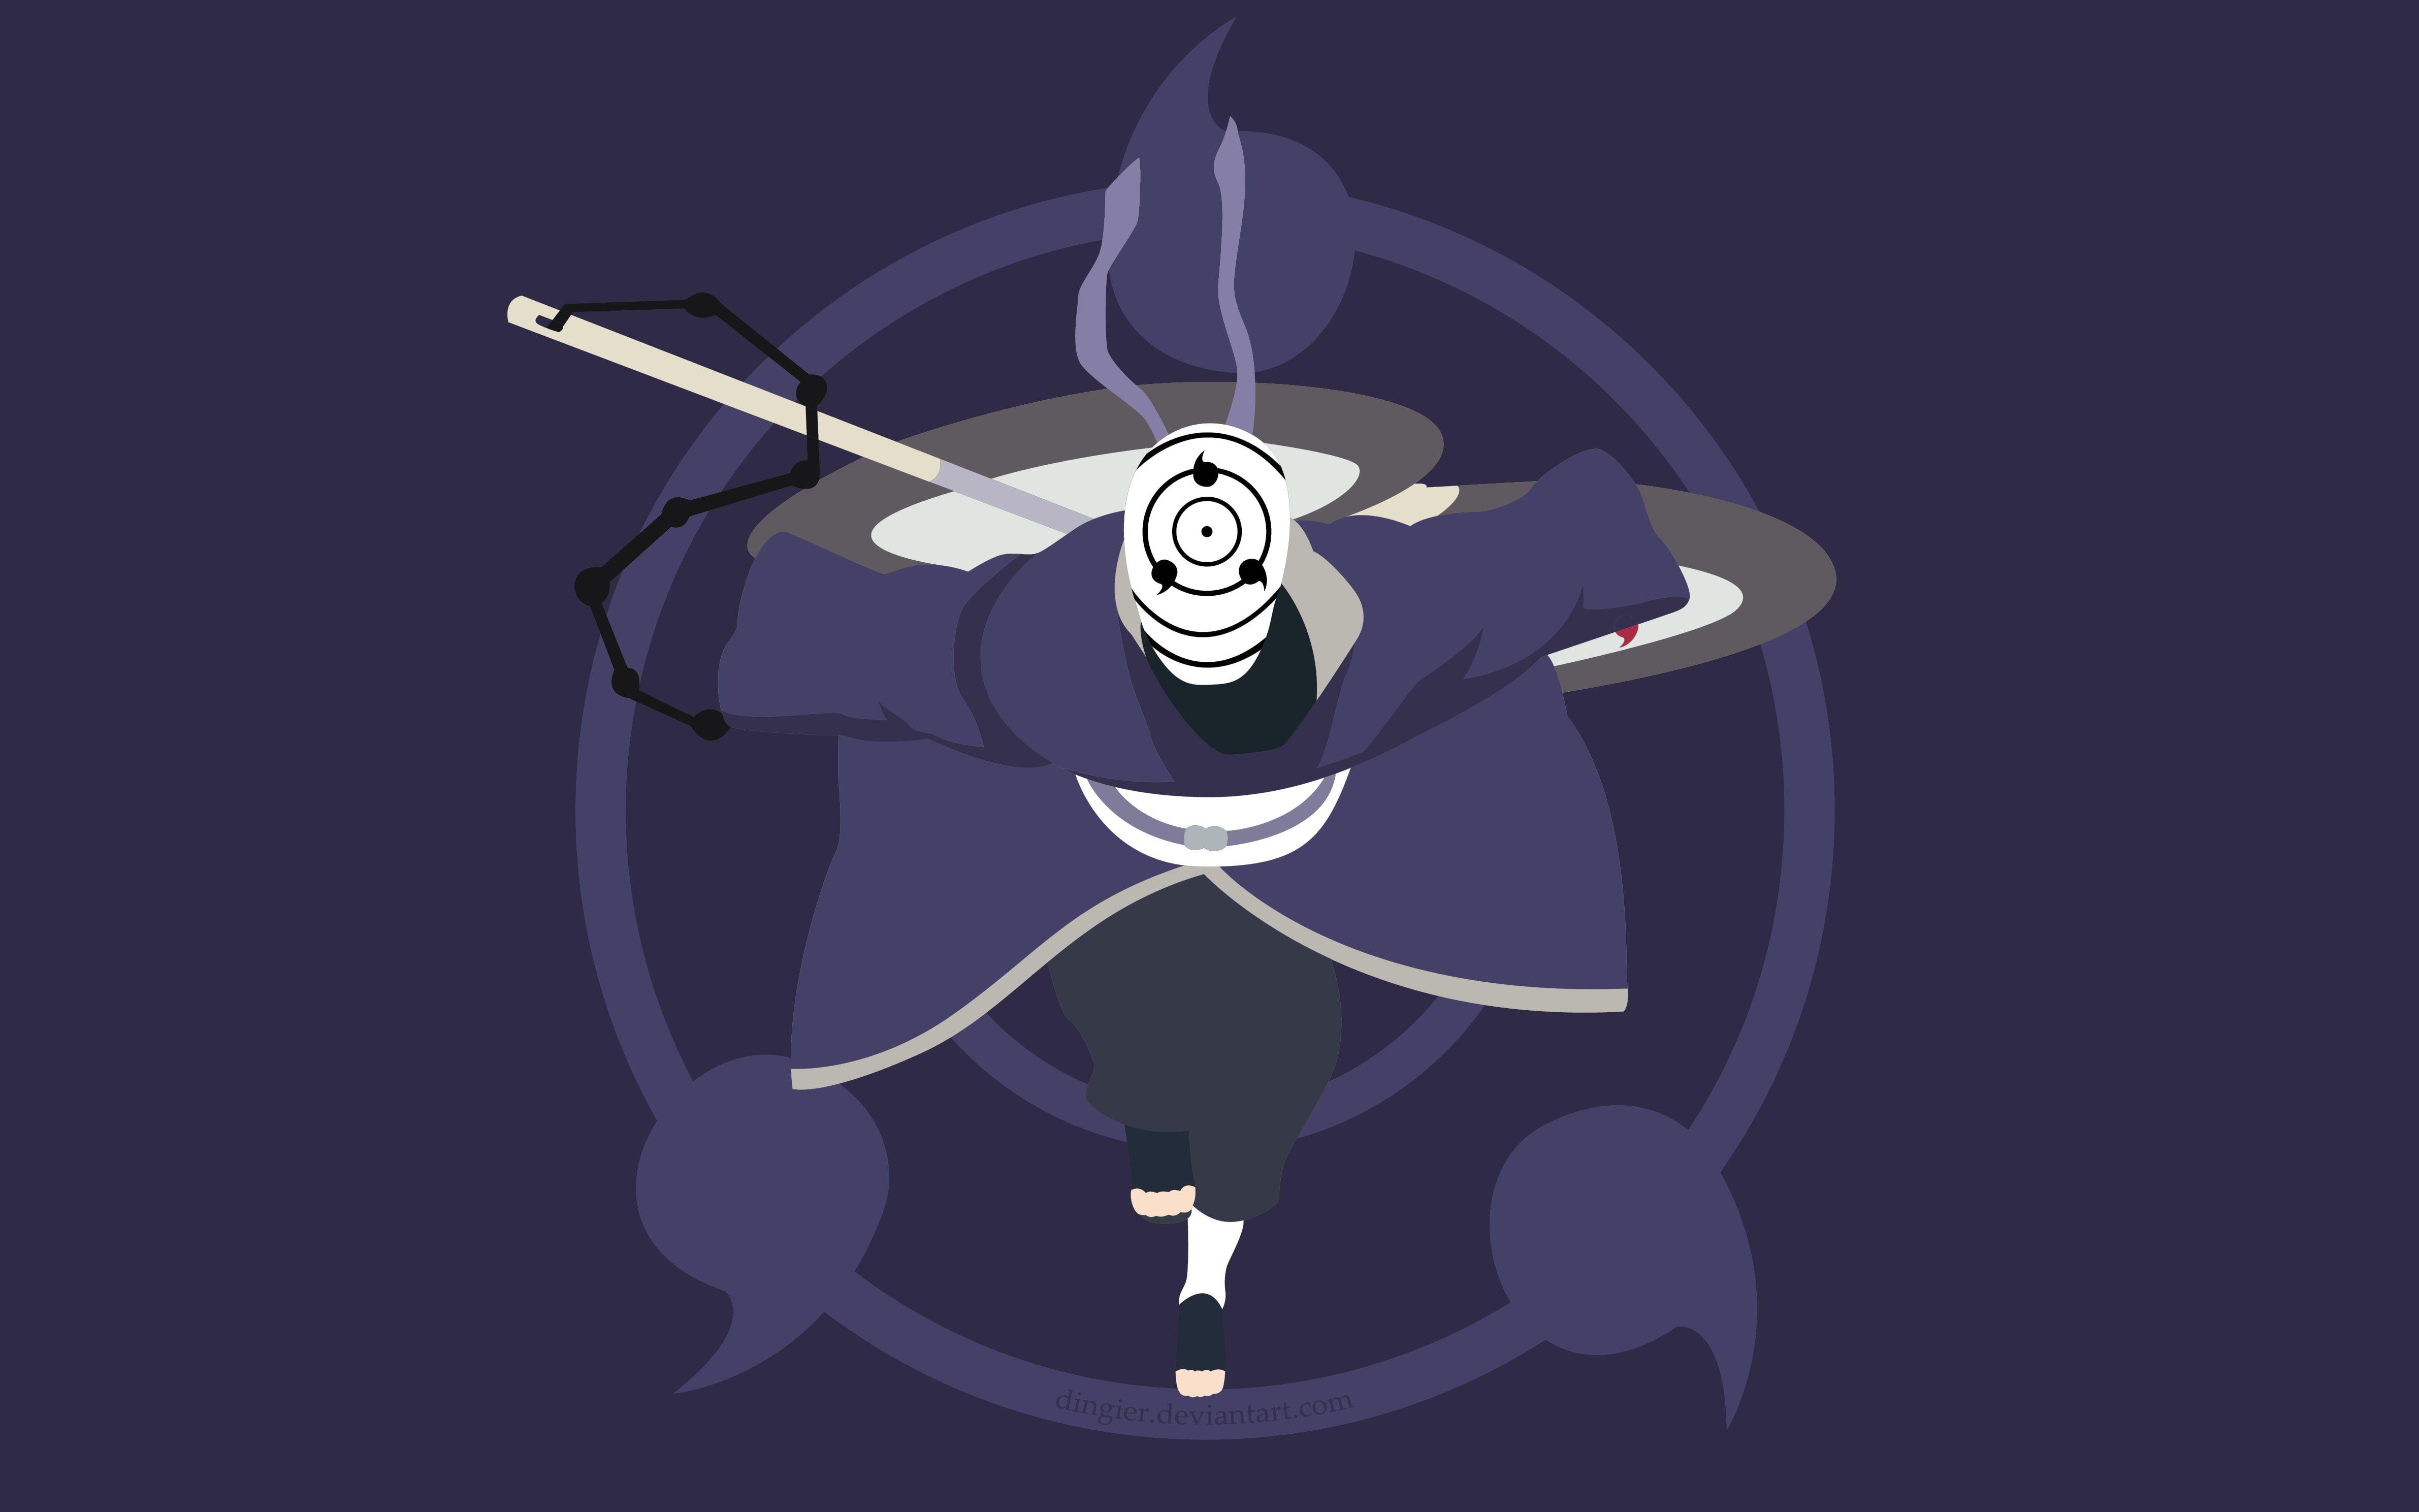 Anime Naruto Obito Uchiha 4k Wallpaper Hdwallpaper Desktop Anime Naruto Uchiha